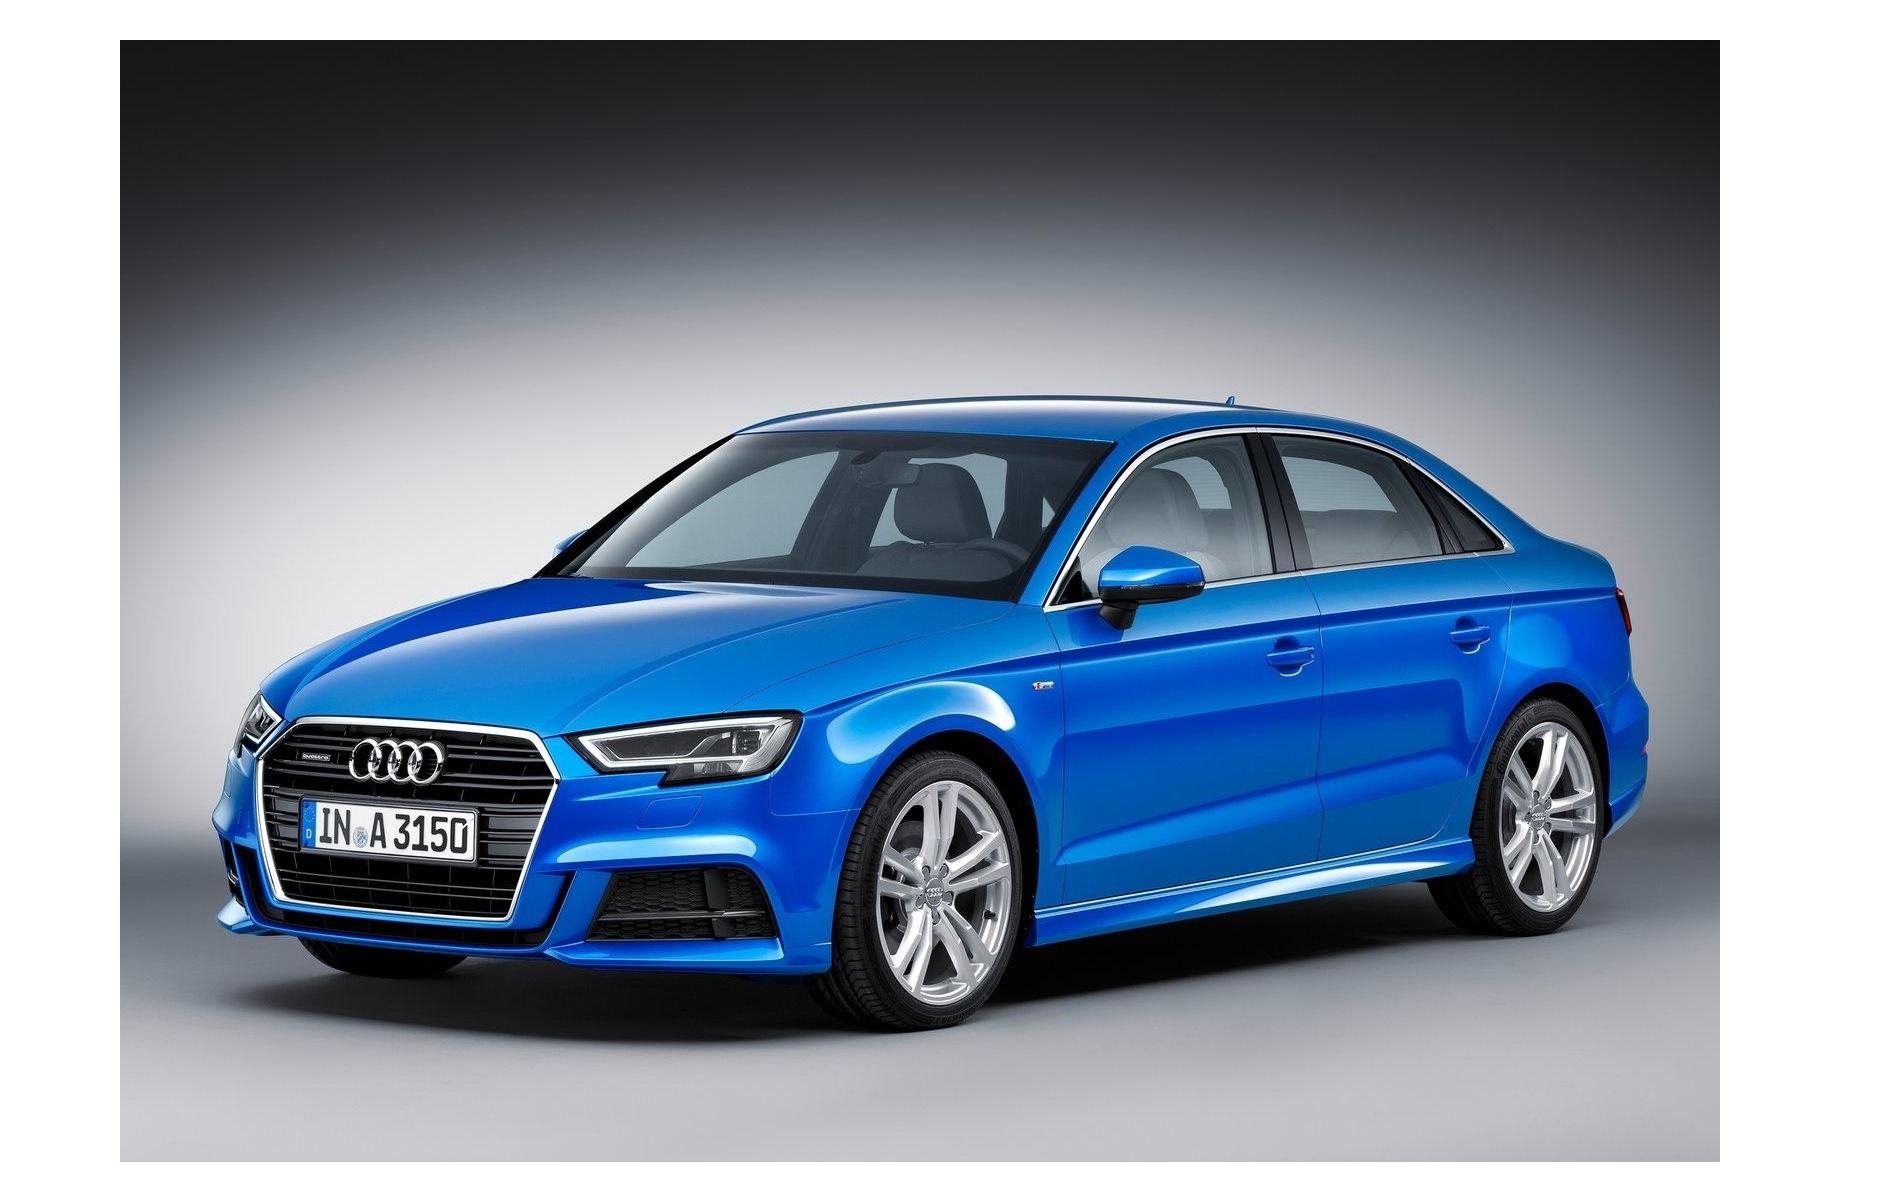 Audi A3 Sedan Price in UAE - New Audi A3 Sedan Photos and Specs | YallaMotor